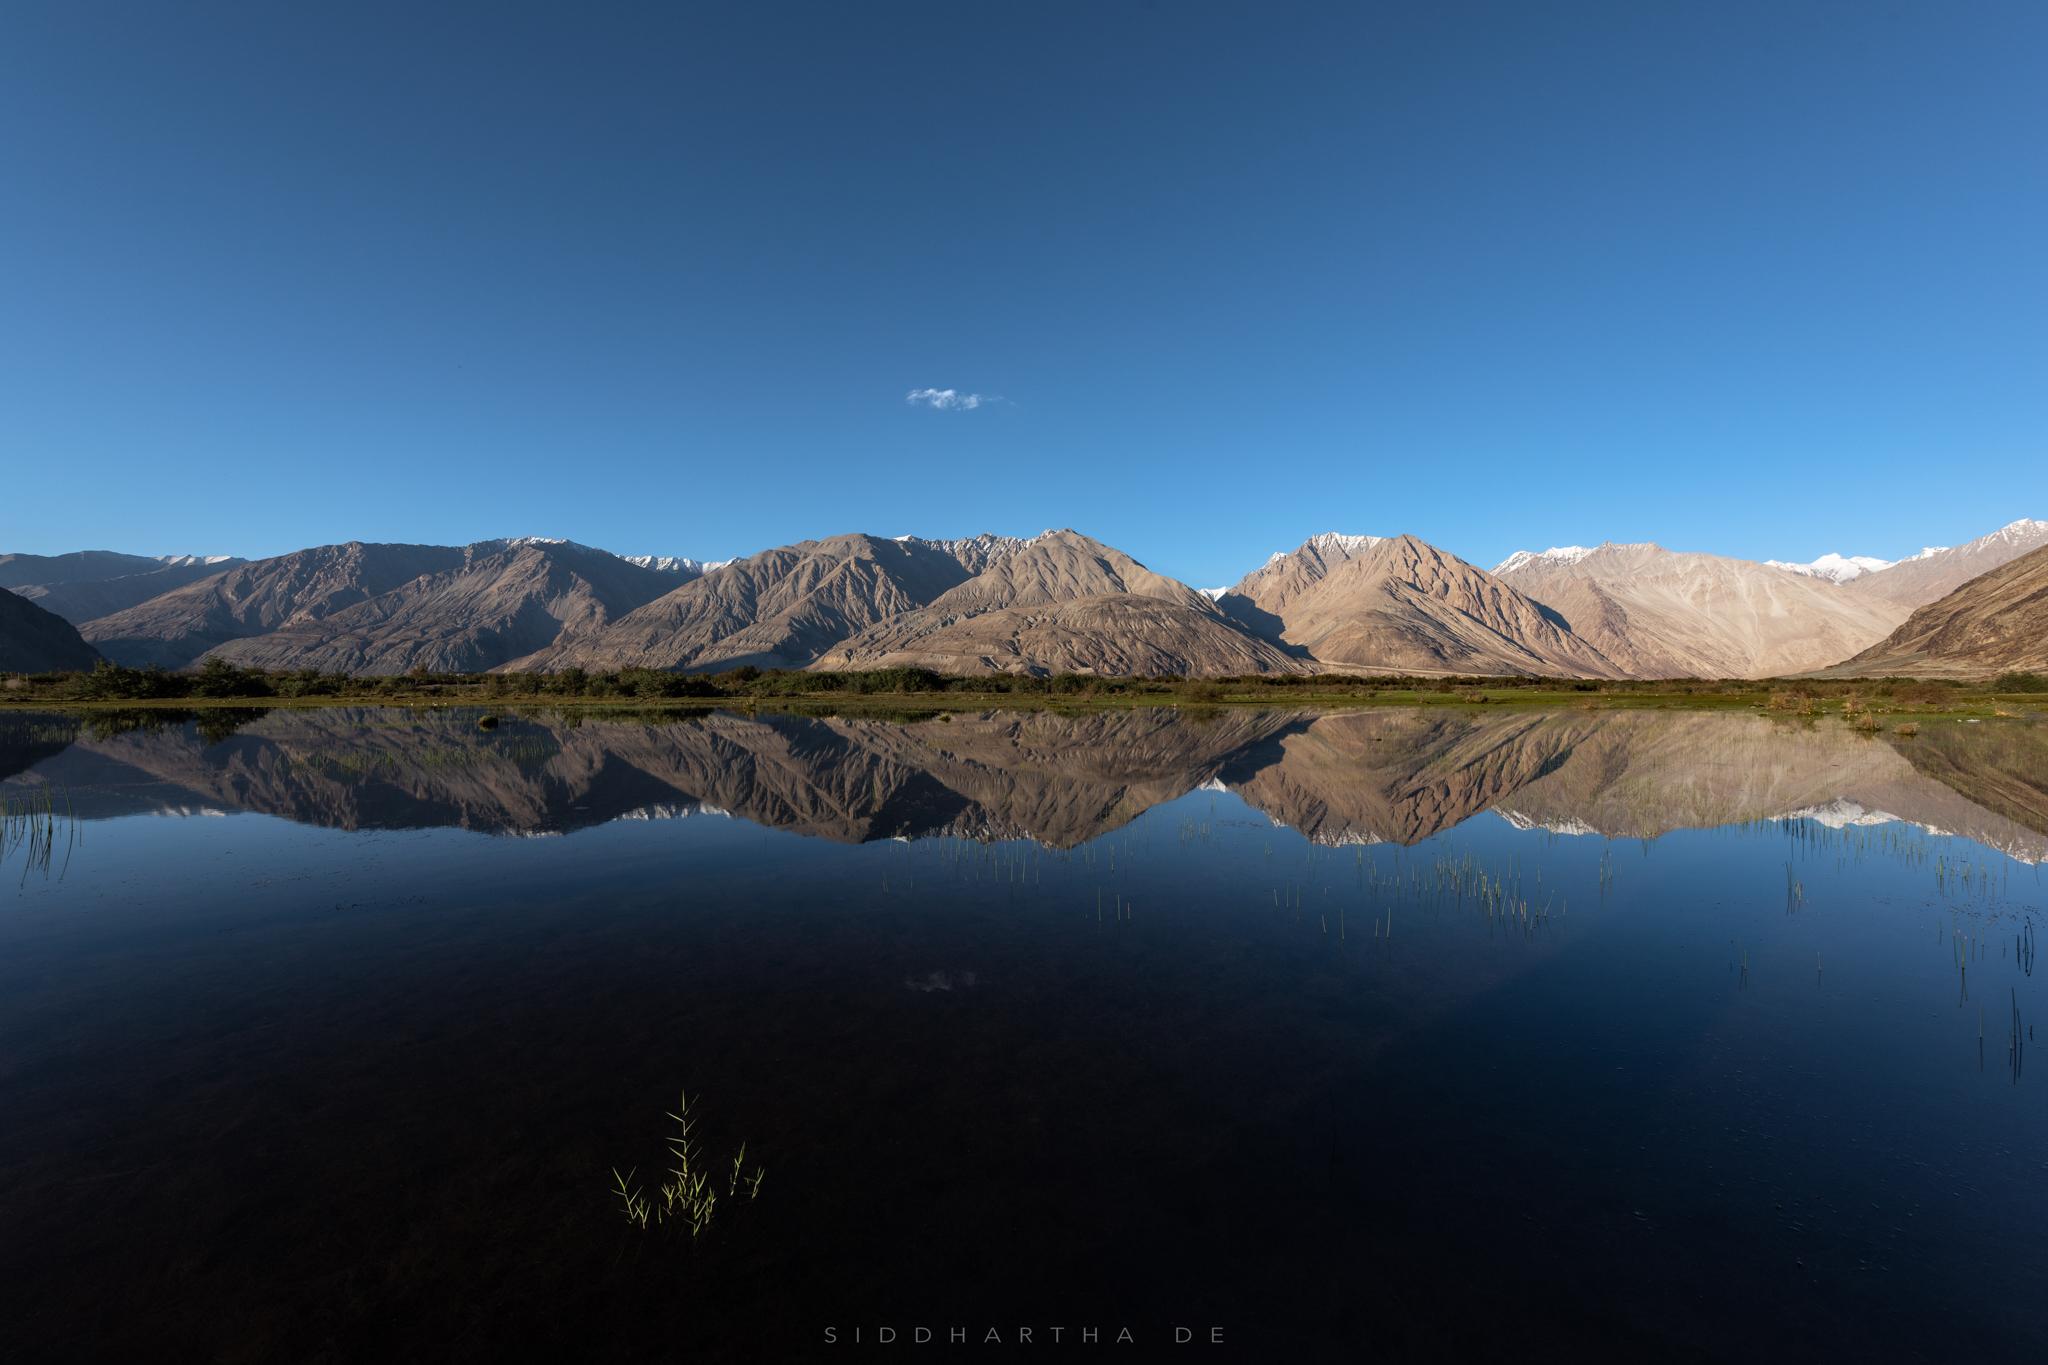 Sd Ladakh 2019 27.jpg